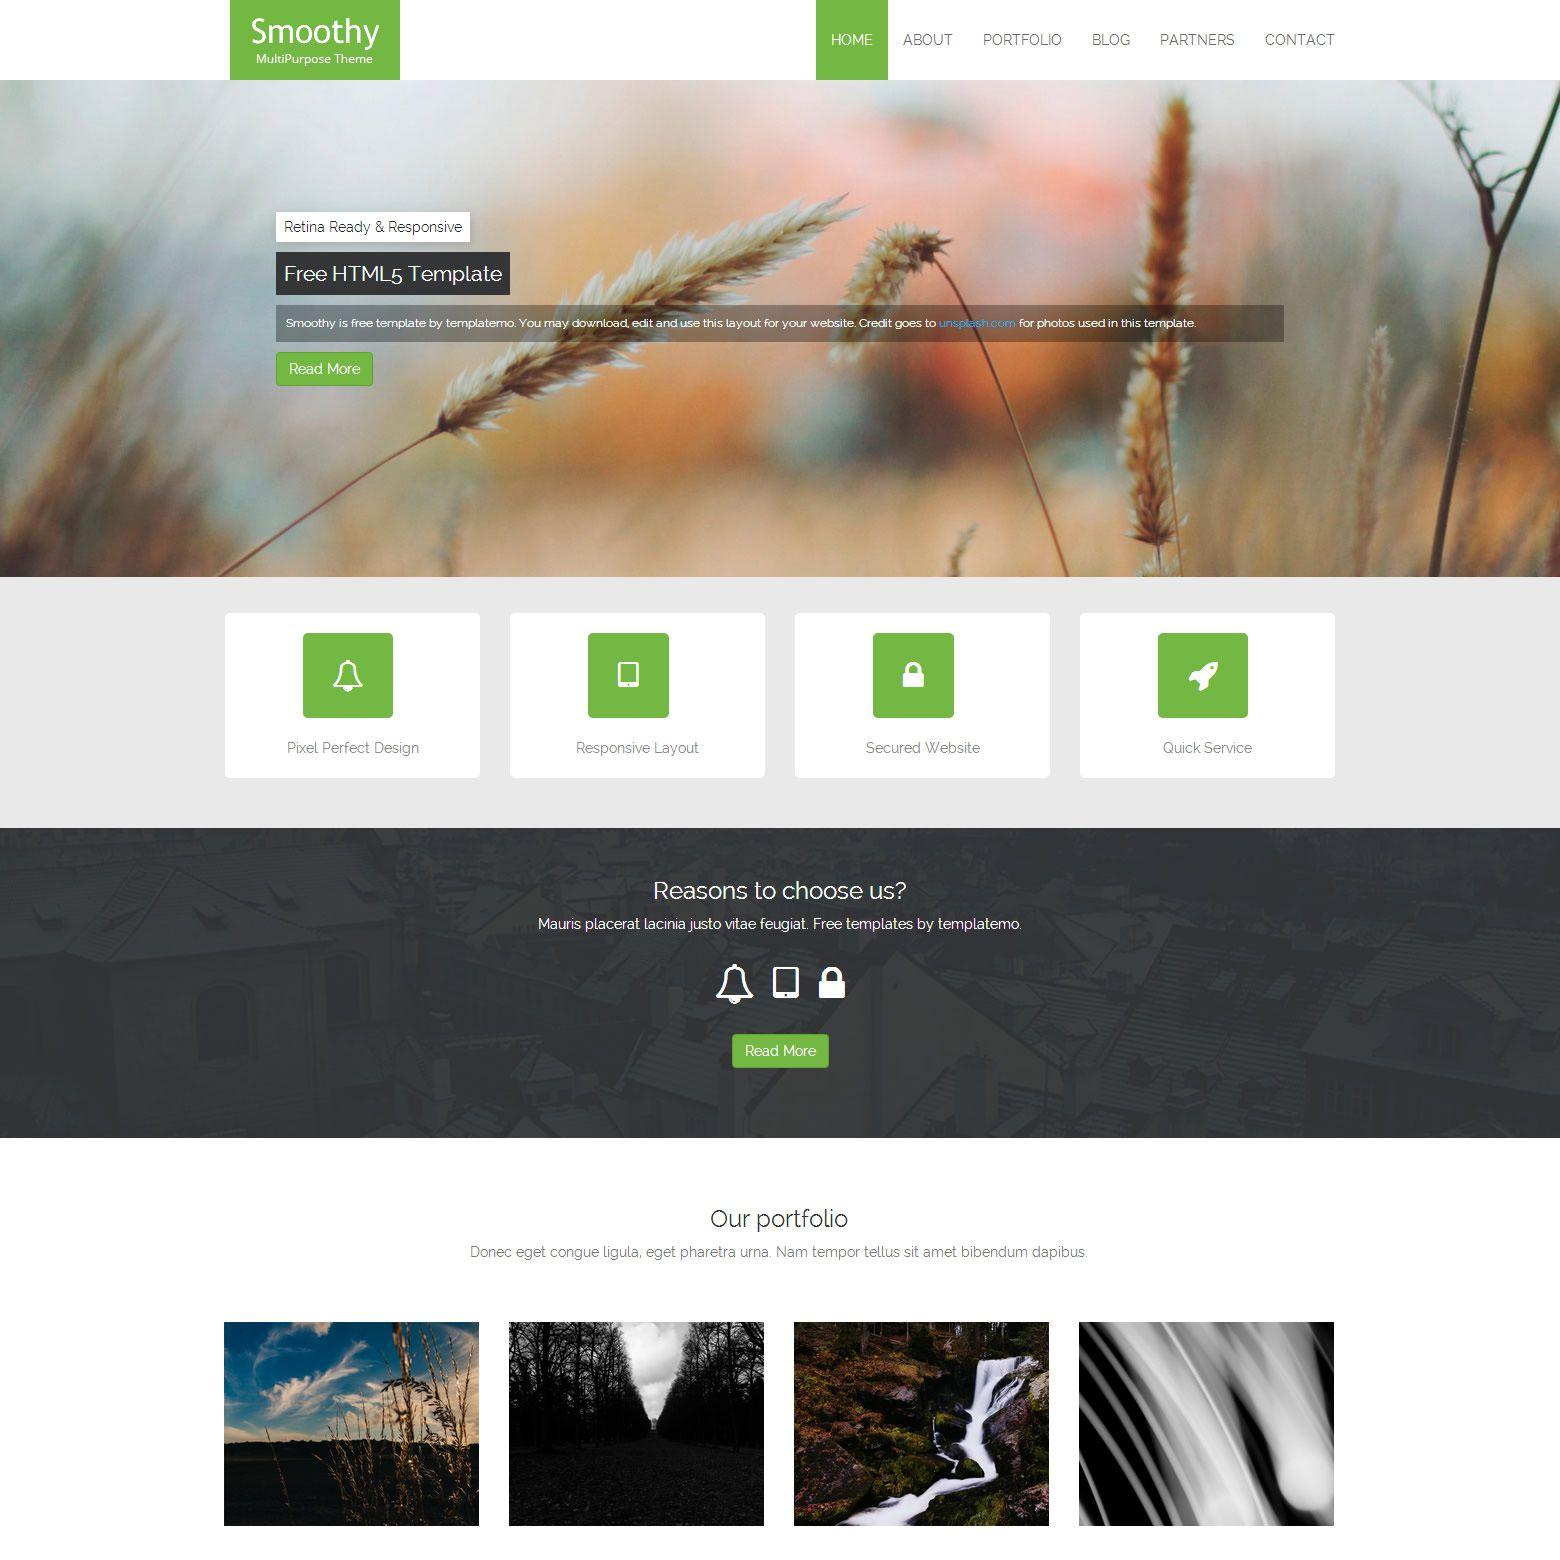 008 Astounding Free Website Template Dreamweaver High Resolution  Ecommerce Download Construction HtmlFull